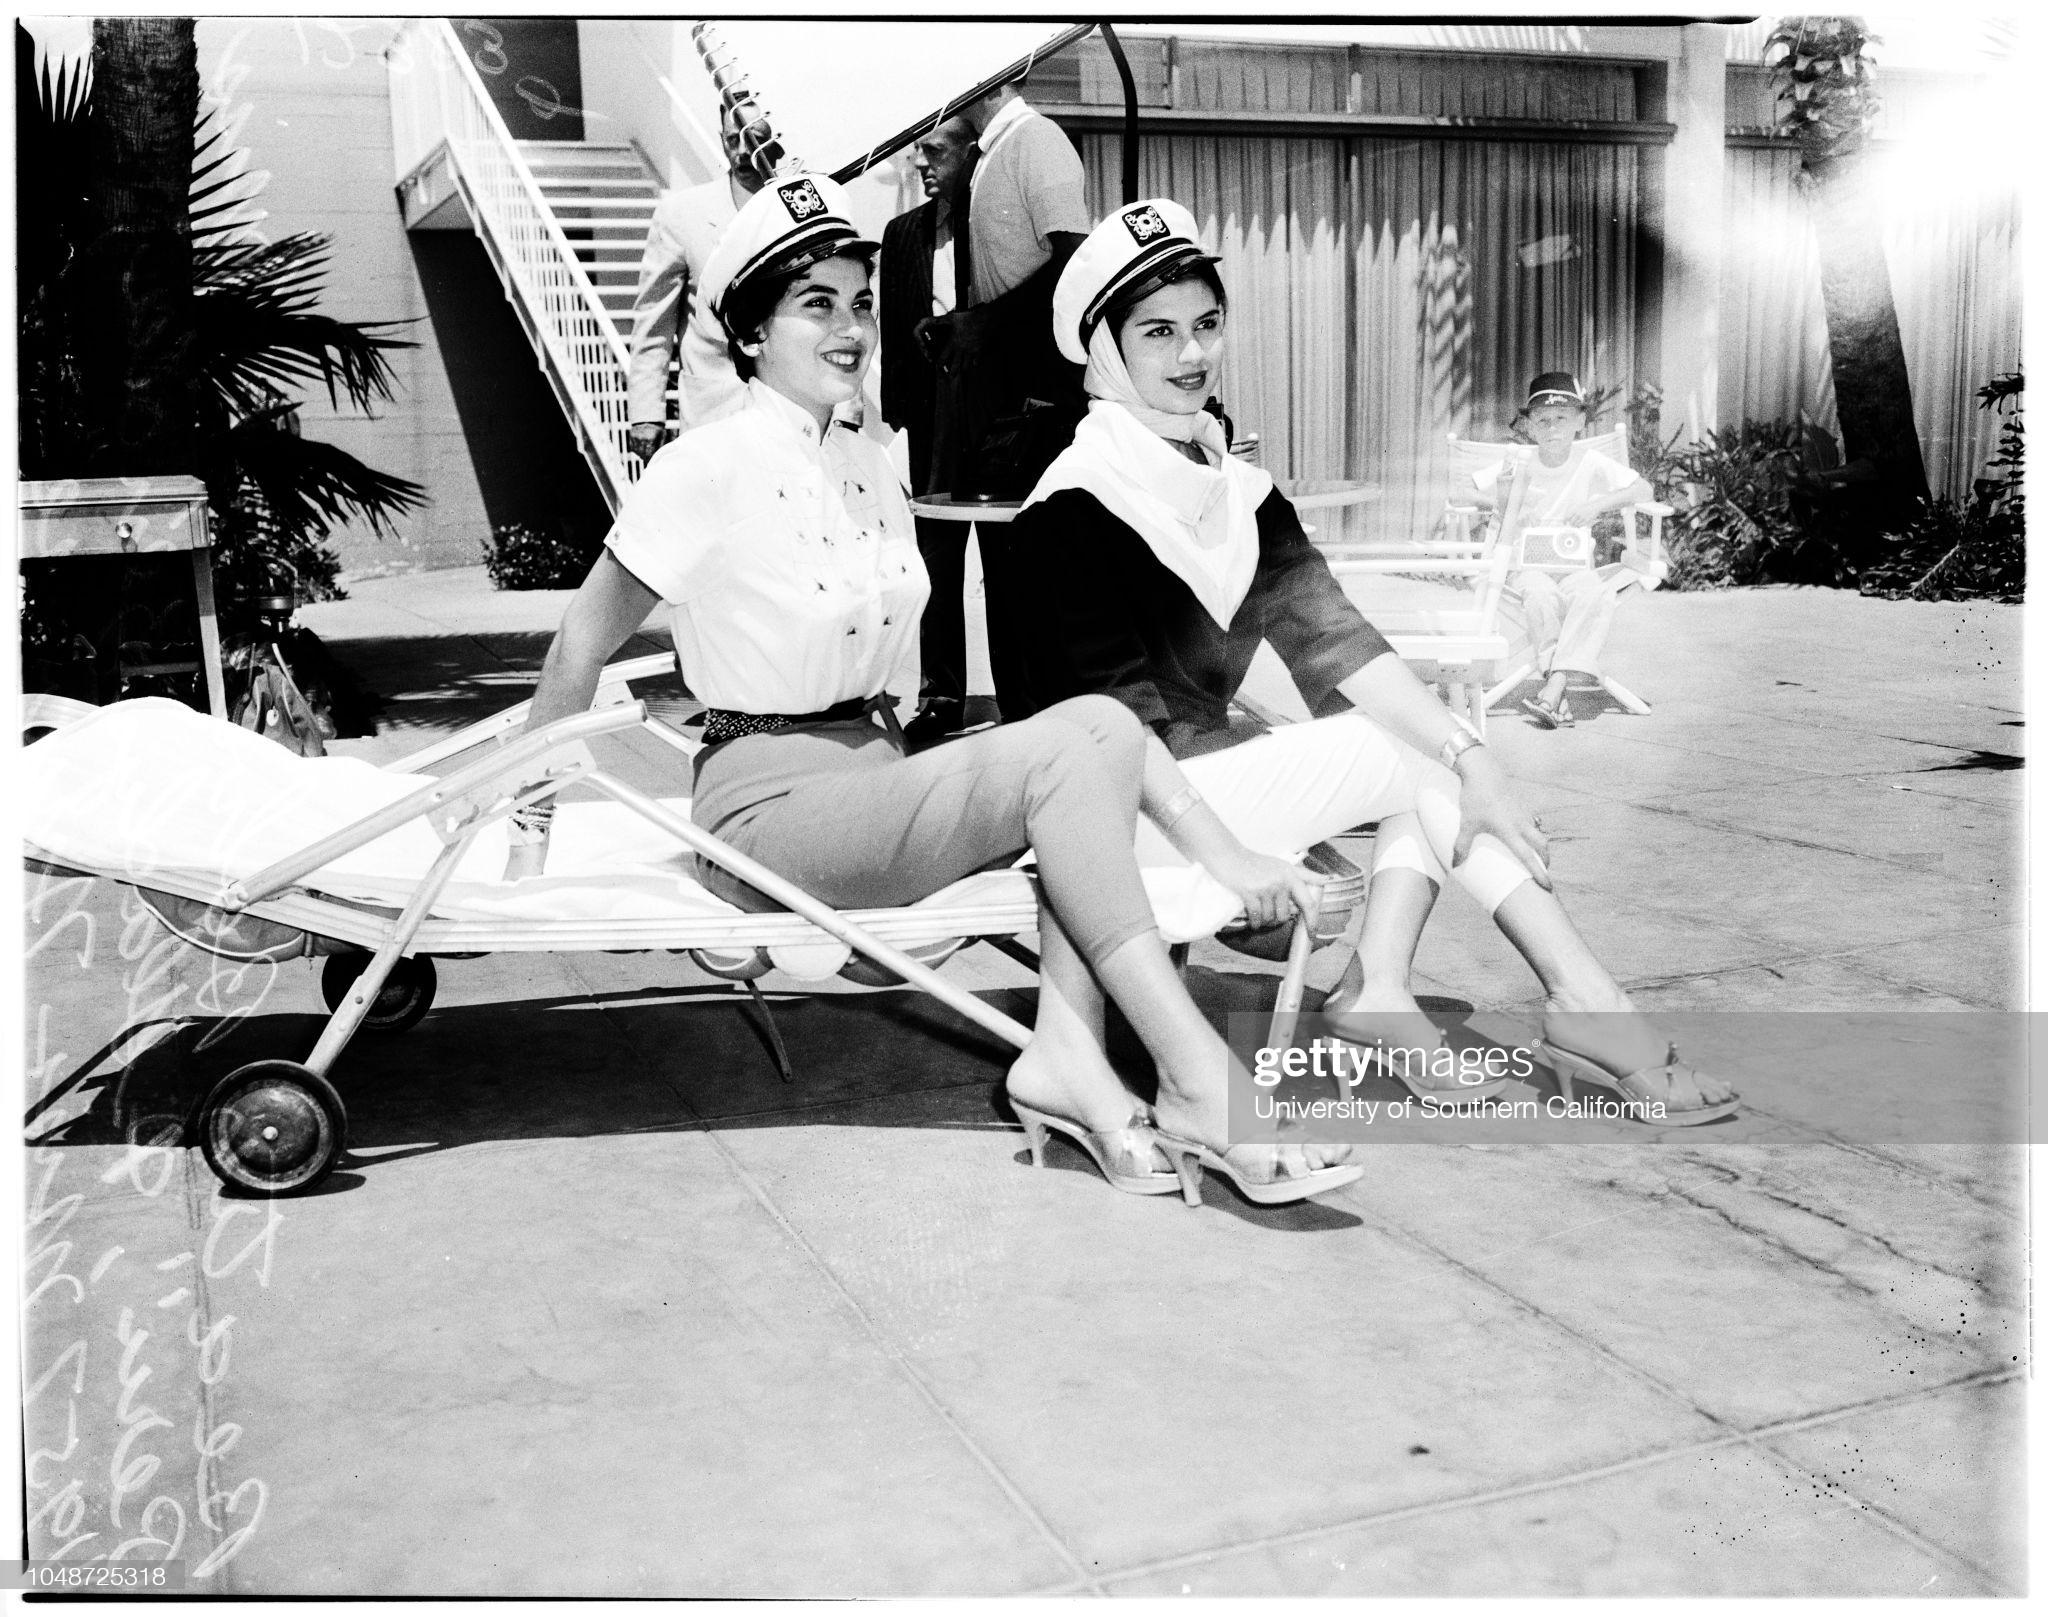 gladys zender, miss universe 1957. primera latina a vencer este concurso. - Página 4 Rvujog10